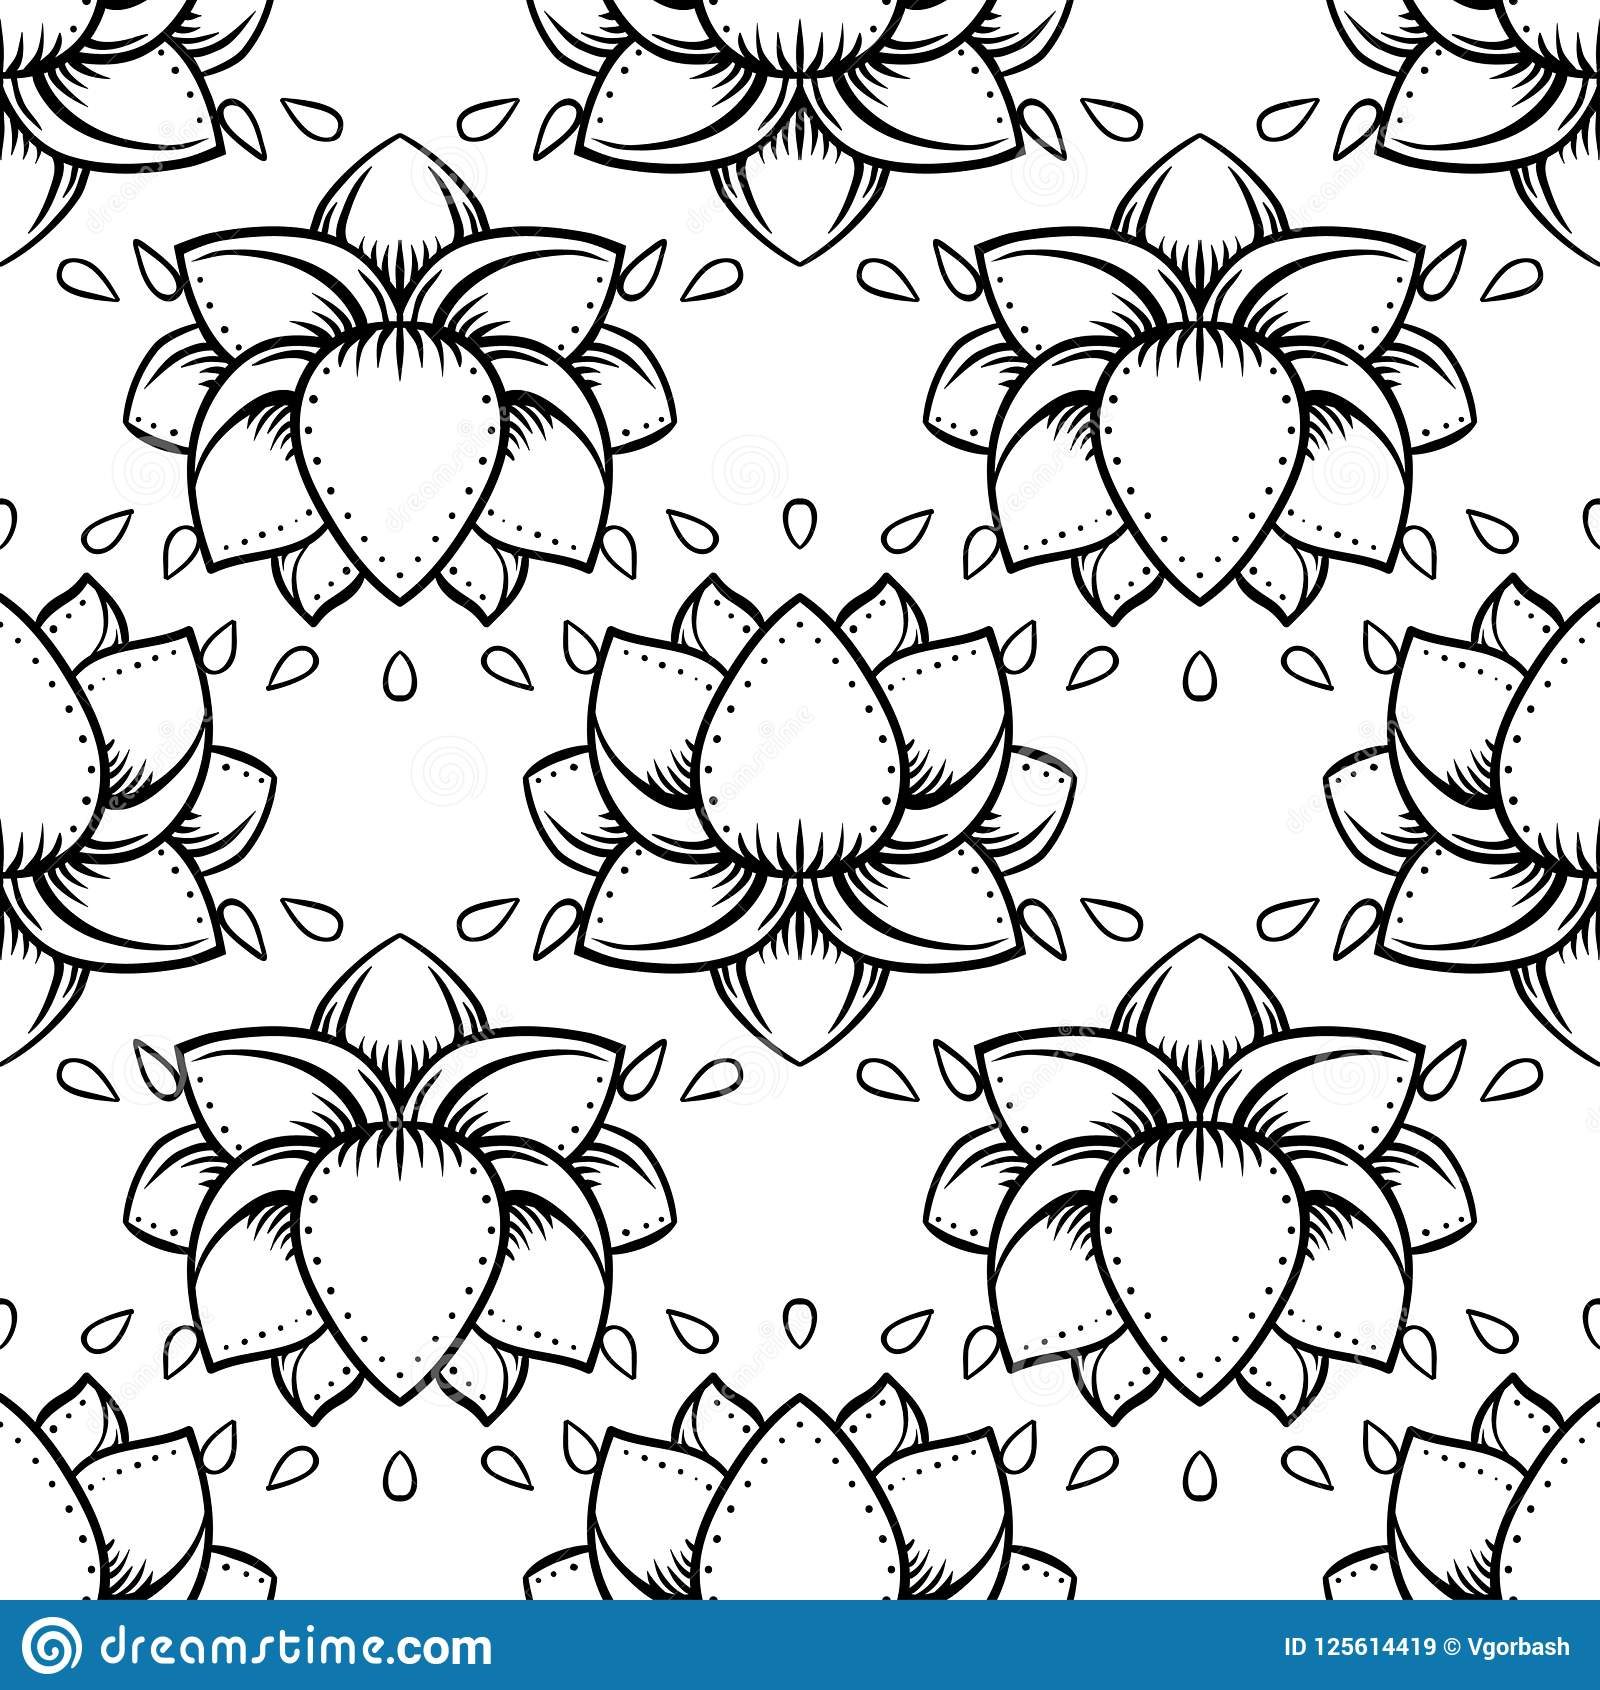 Stylish lotus flowers seamless pattern ayurveda symbol of harmo stylish lotus flowers seamless pattern ayurveda symbol of harmony and balance and universe tattoo design yoga logo boho printwrapping paper izmirmasajfo